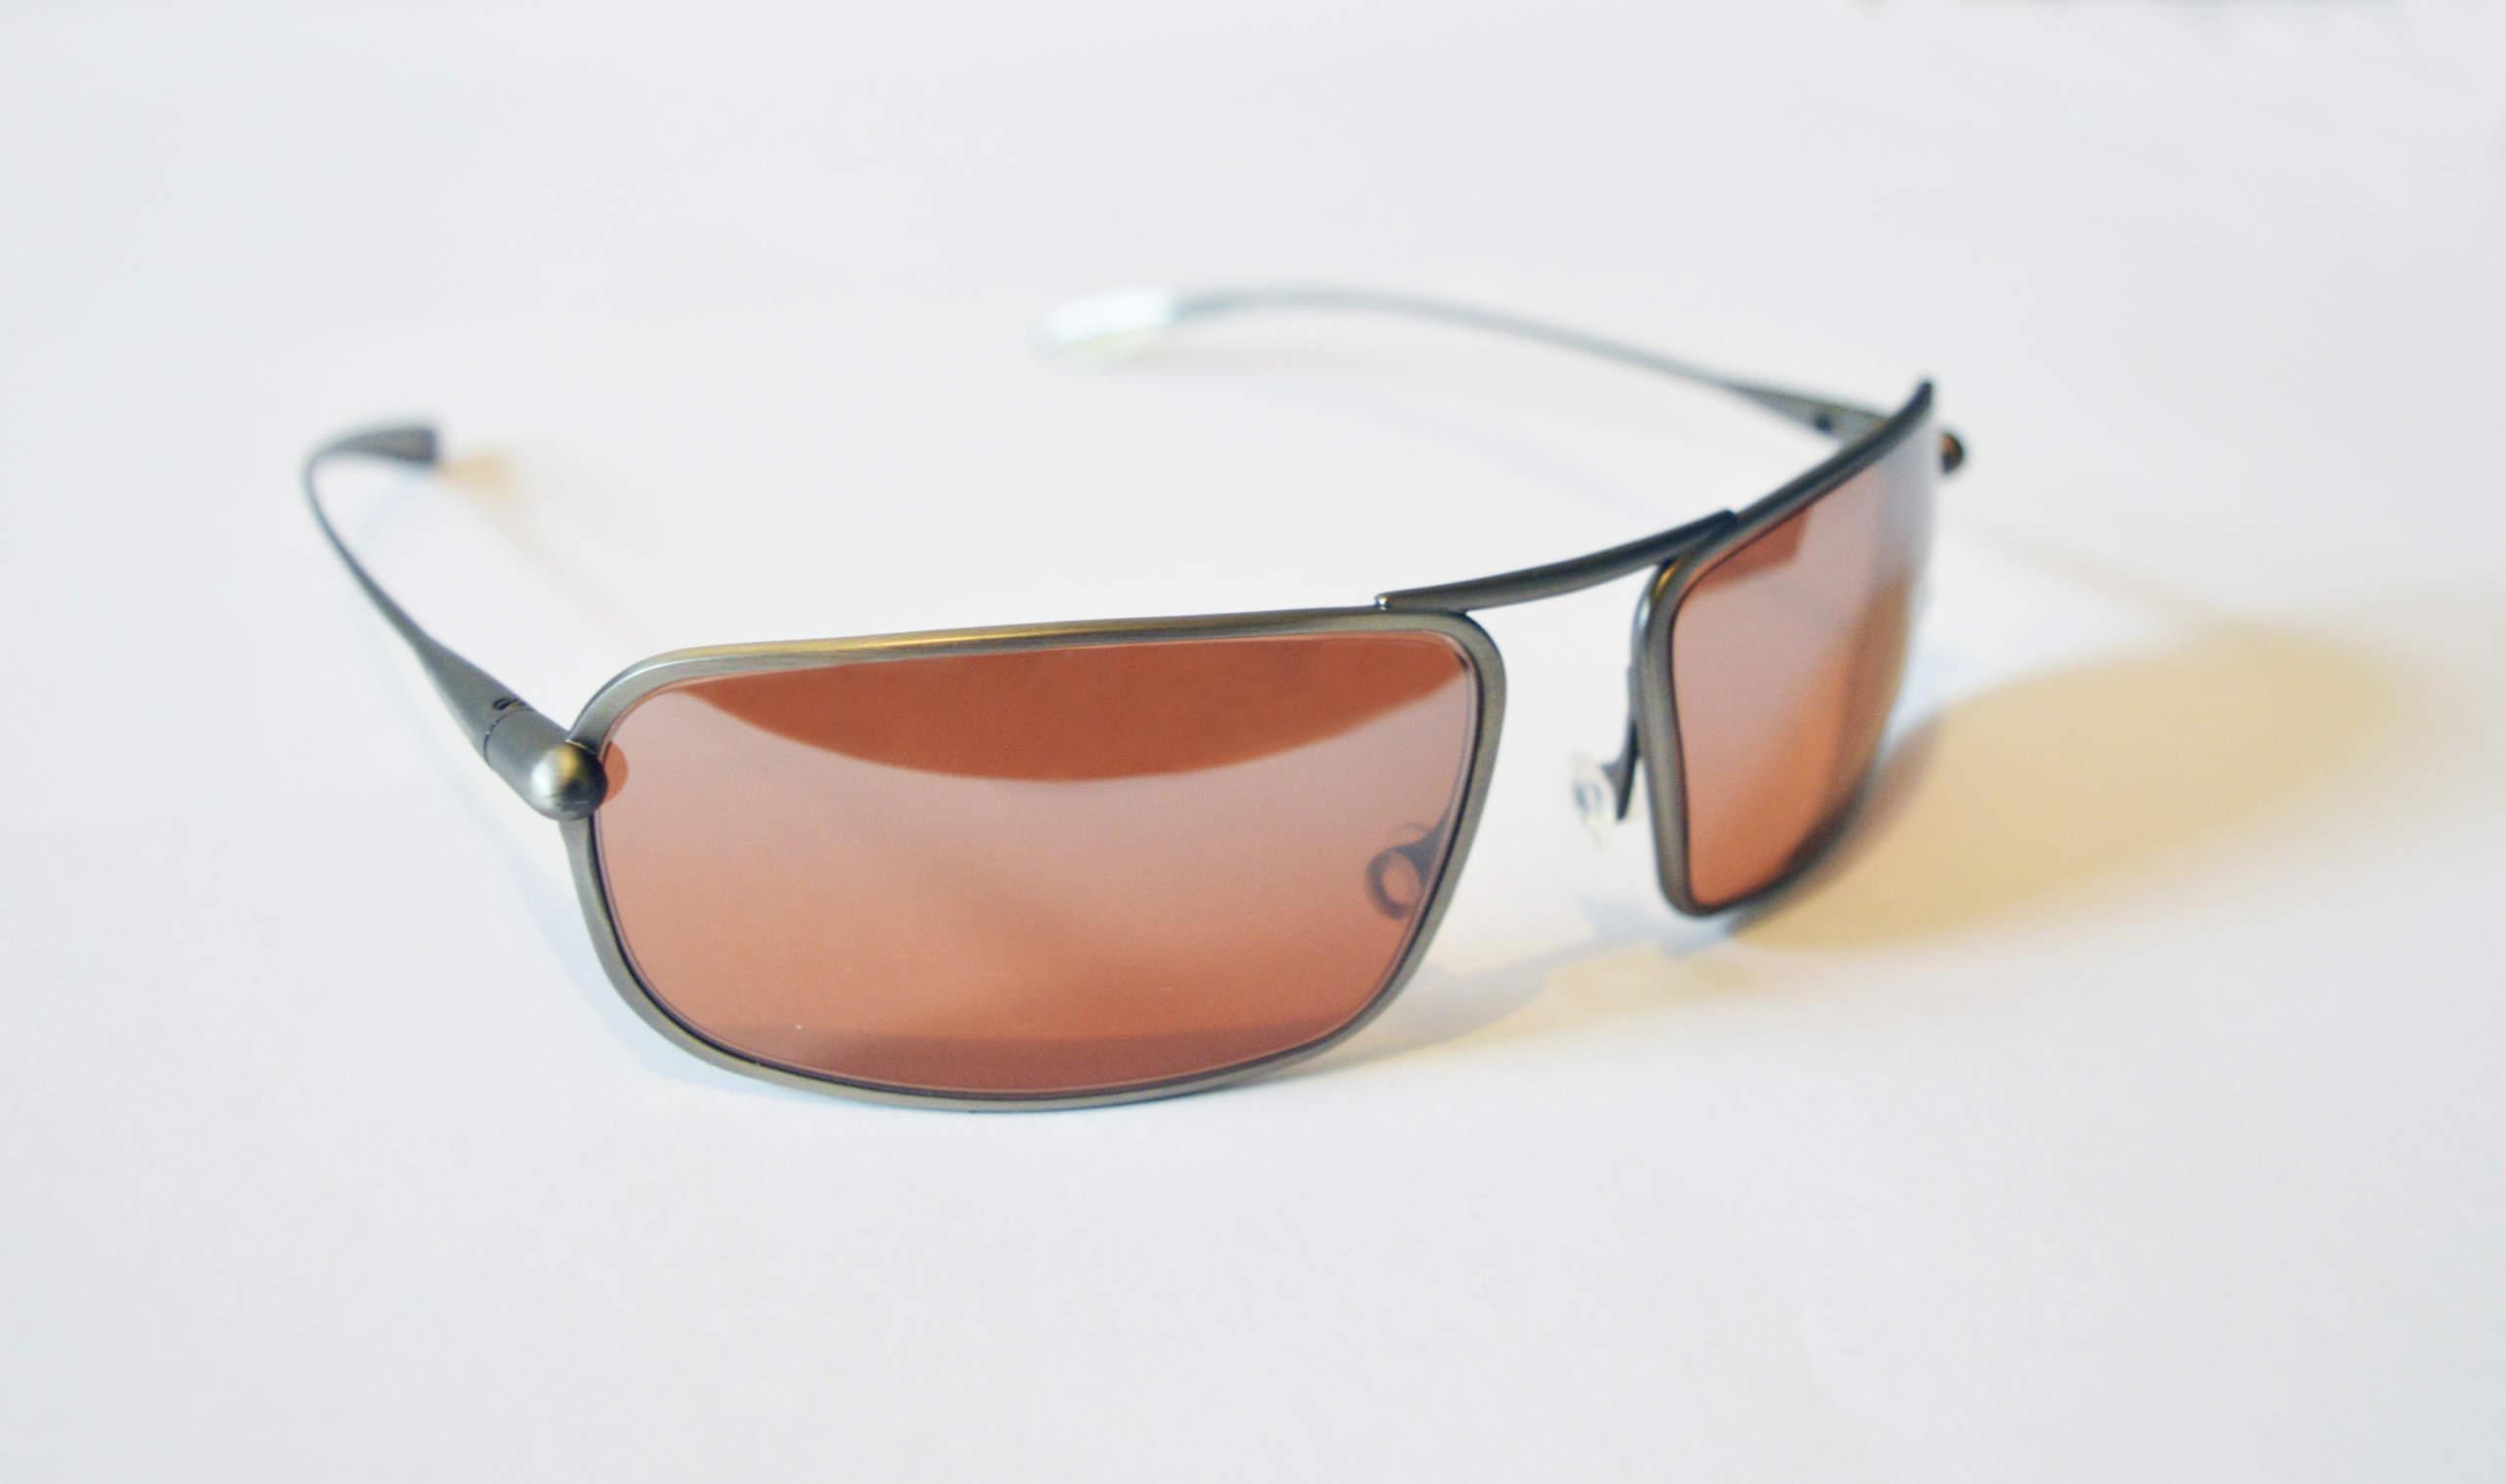 Meso - Natural Titanium Frame Silver Gradient Mirror Photochromic Sunglasses